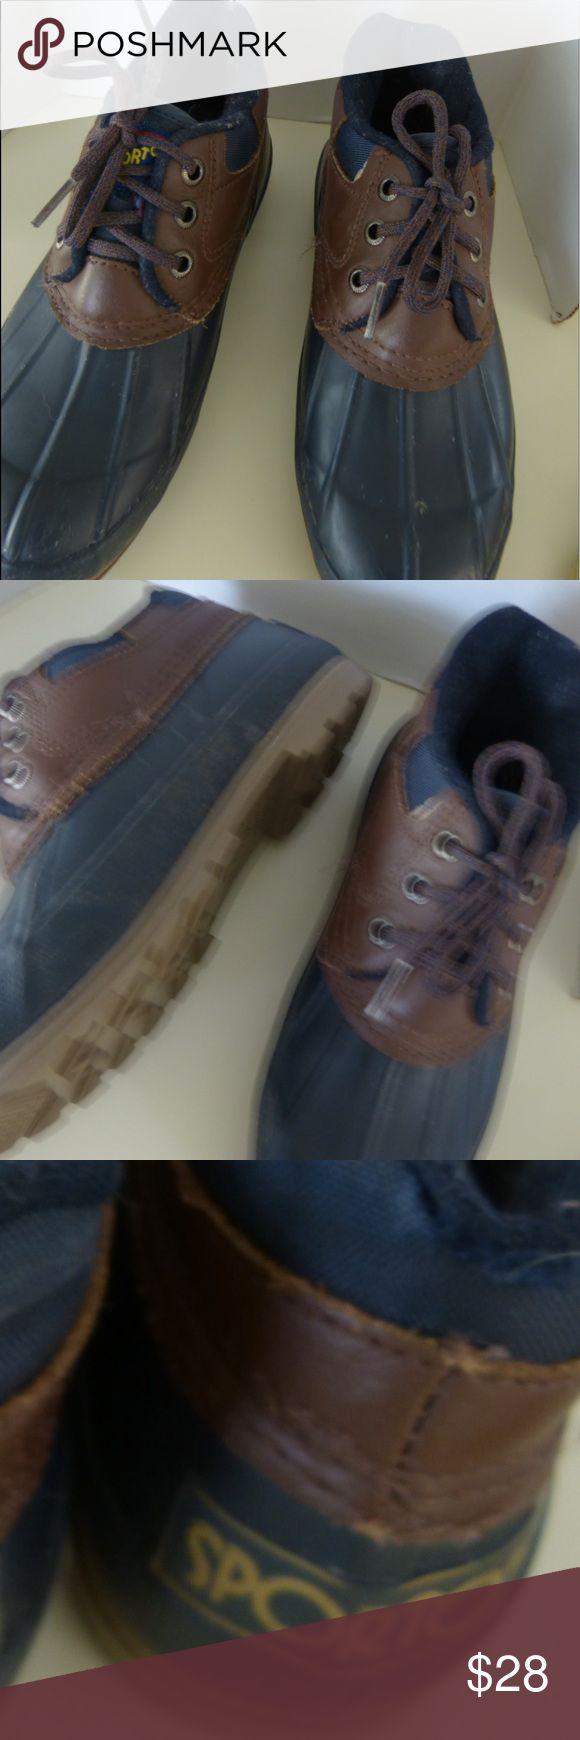 Sporto Women's Duck Boots Shoes Size 6 Sporto Women's Duck Boots Shoes Size 6 Great condition Sporto Shoes